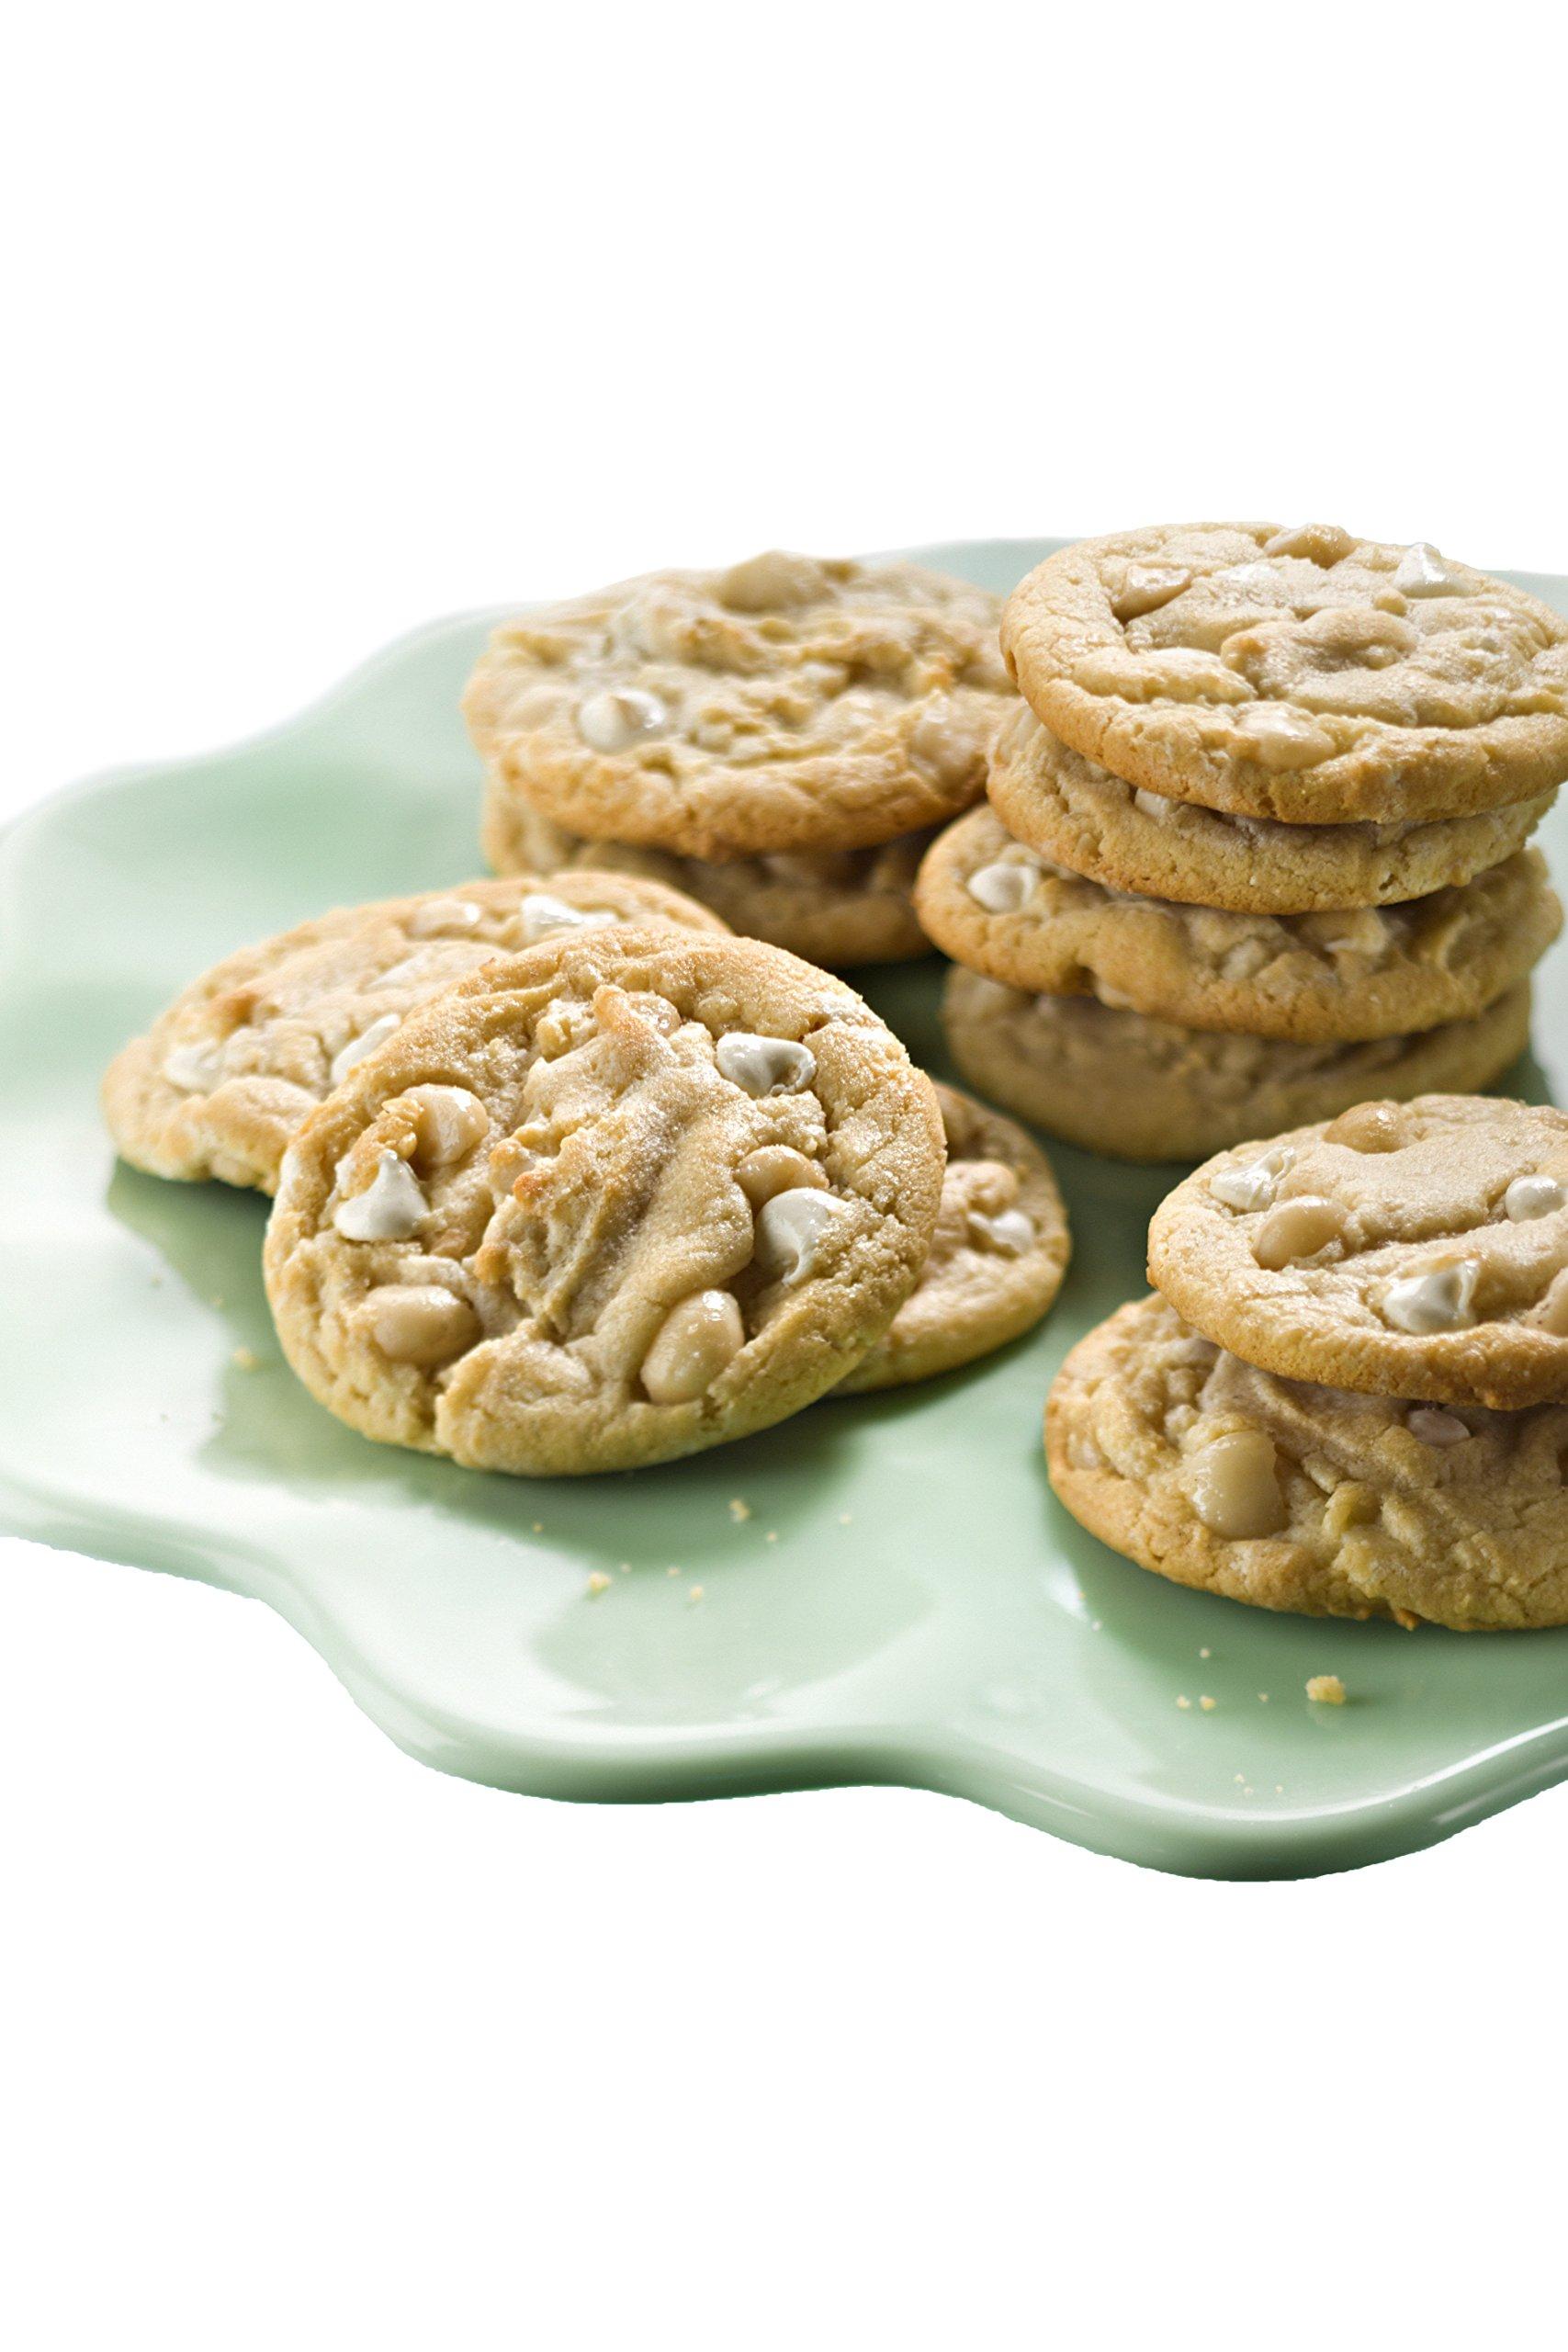 Neighbors Preportioned White Chocolate Macadamia Cookie Dough, 2.7 Pound by Neighbors